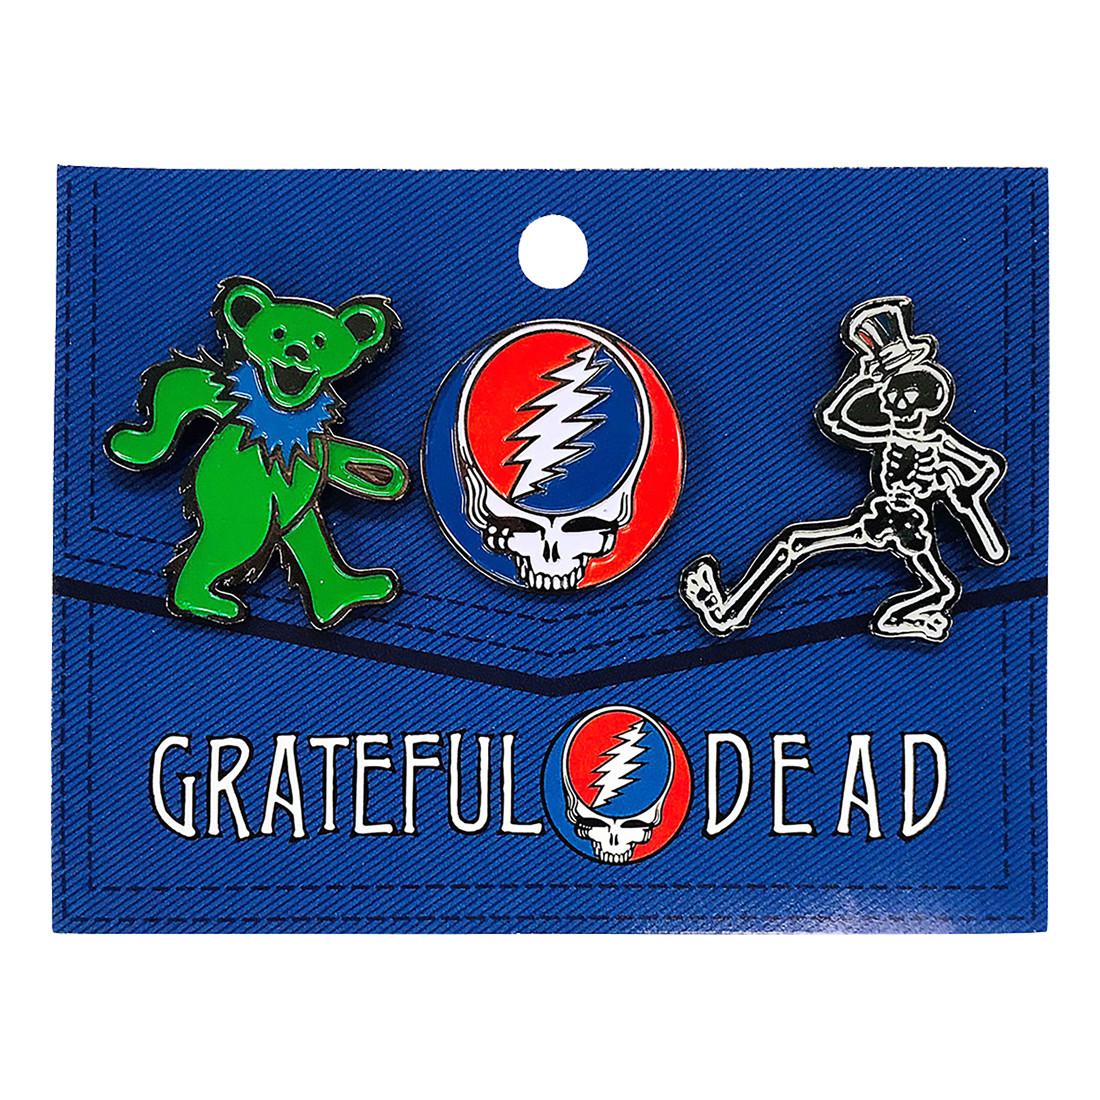 Grateful Dead 3 Pack Enamel Pin Set